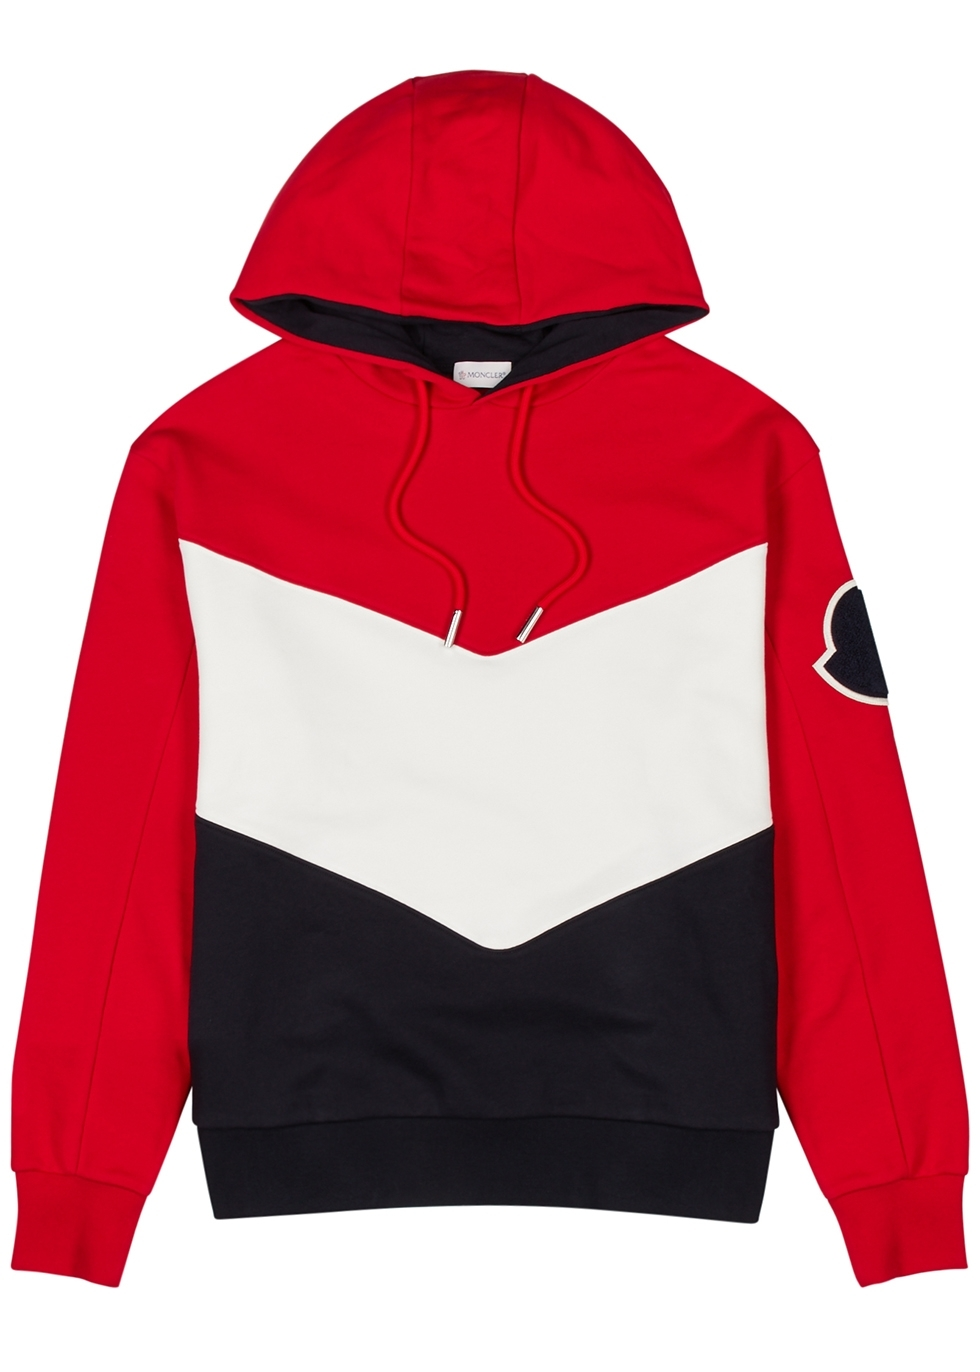 e476815c1746 Moncler - Designer Jackets